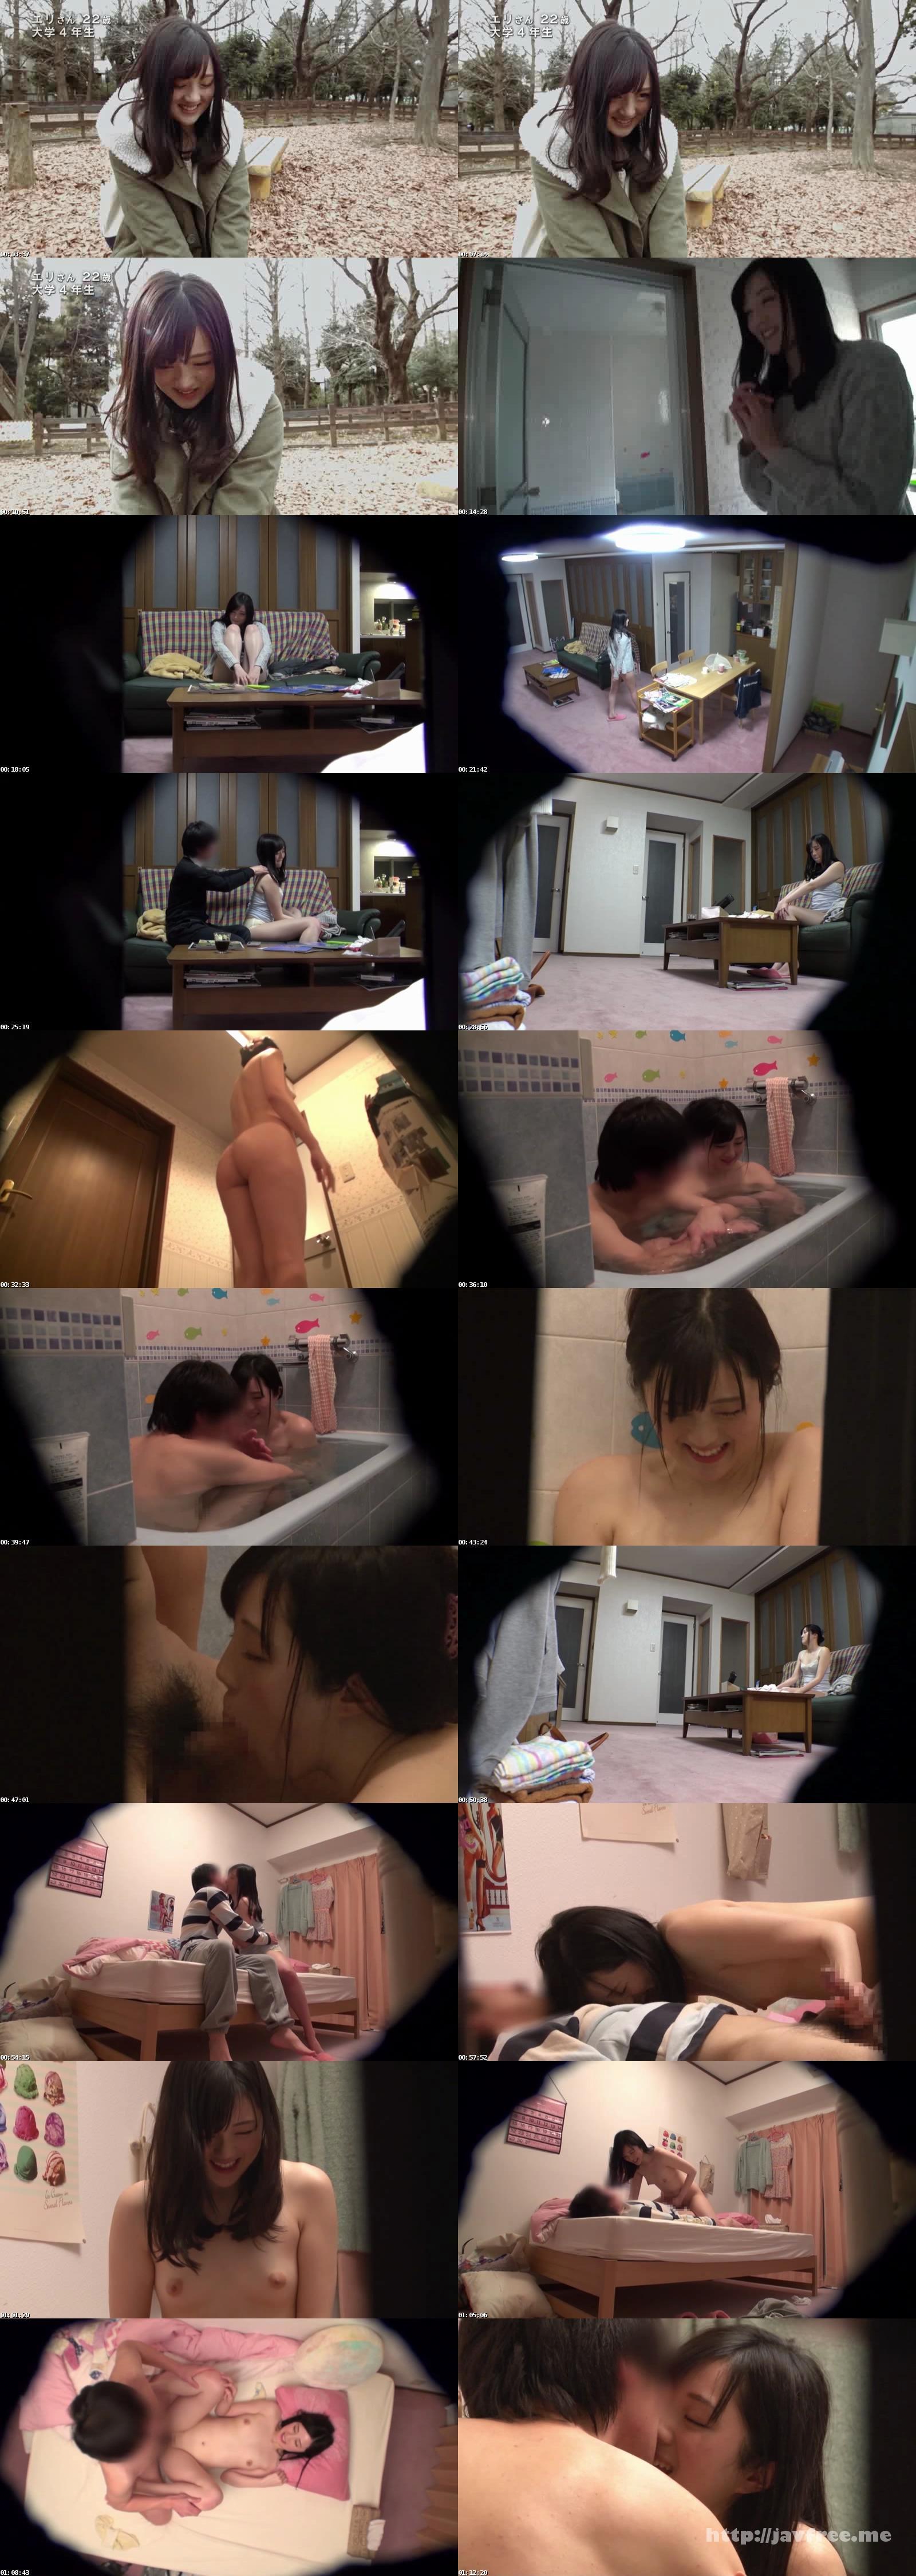 [SDMU-208] 成熟した姉の裸に触れた童貞弟はイケない事と知りつつもチ○ポを勃起させて「禁断の近親相姦」してしまうのか!? 5 真正中出しスペシャル - image SDMU-208b on https://javfree.me